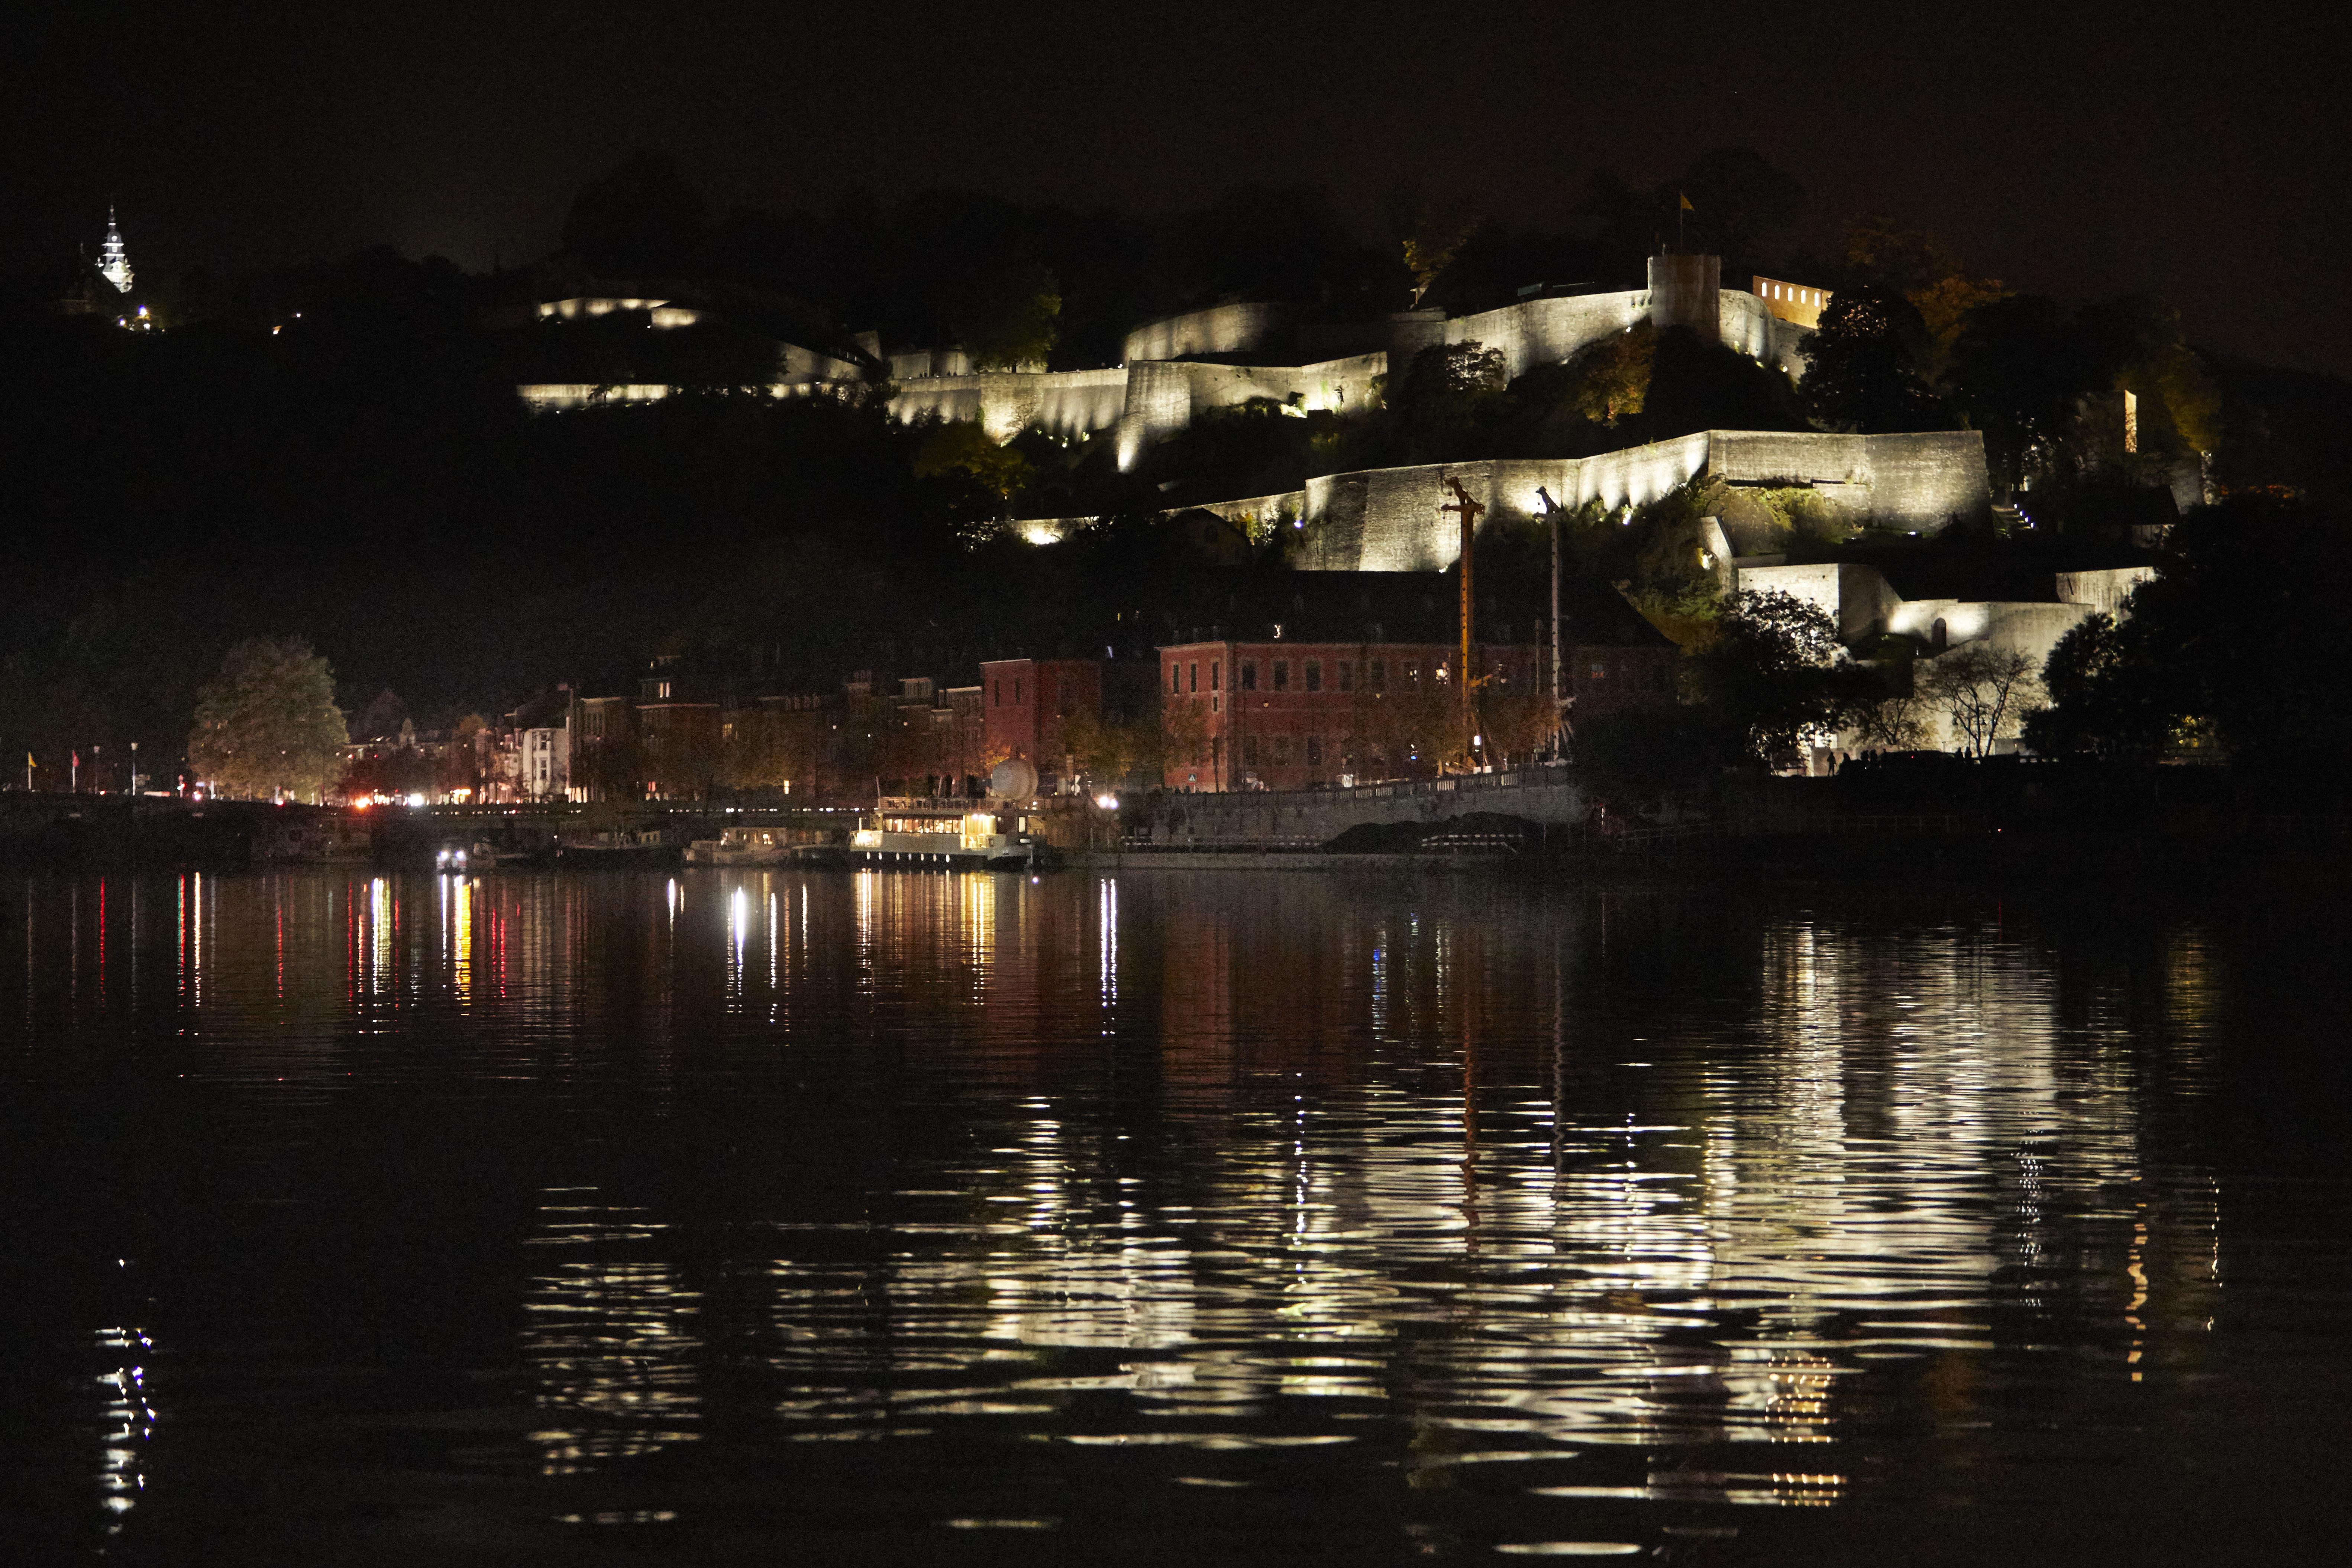 Citadel of Namur - Namur, Belgium